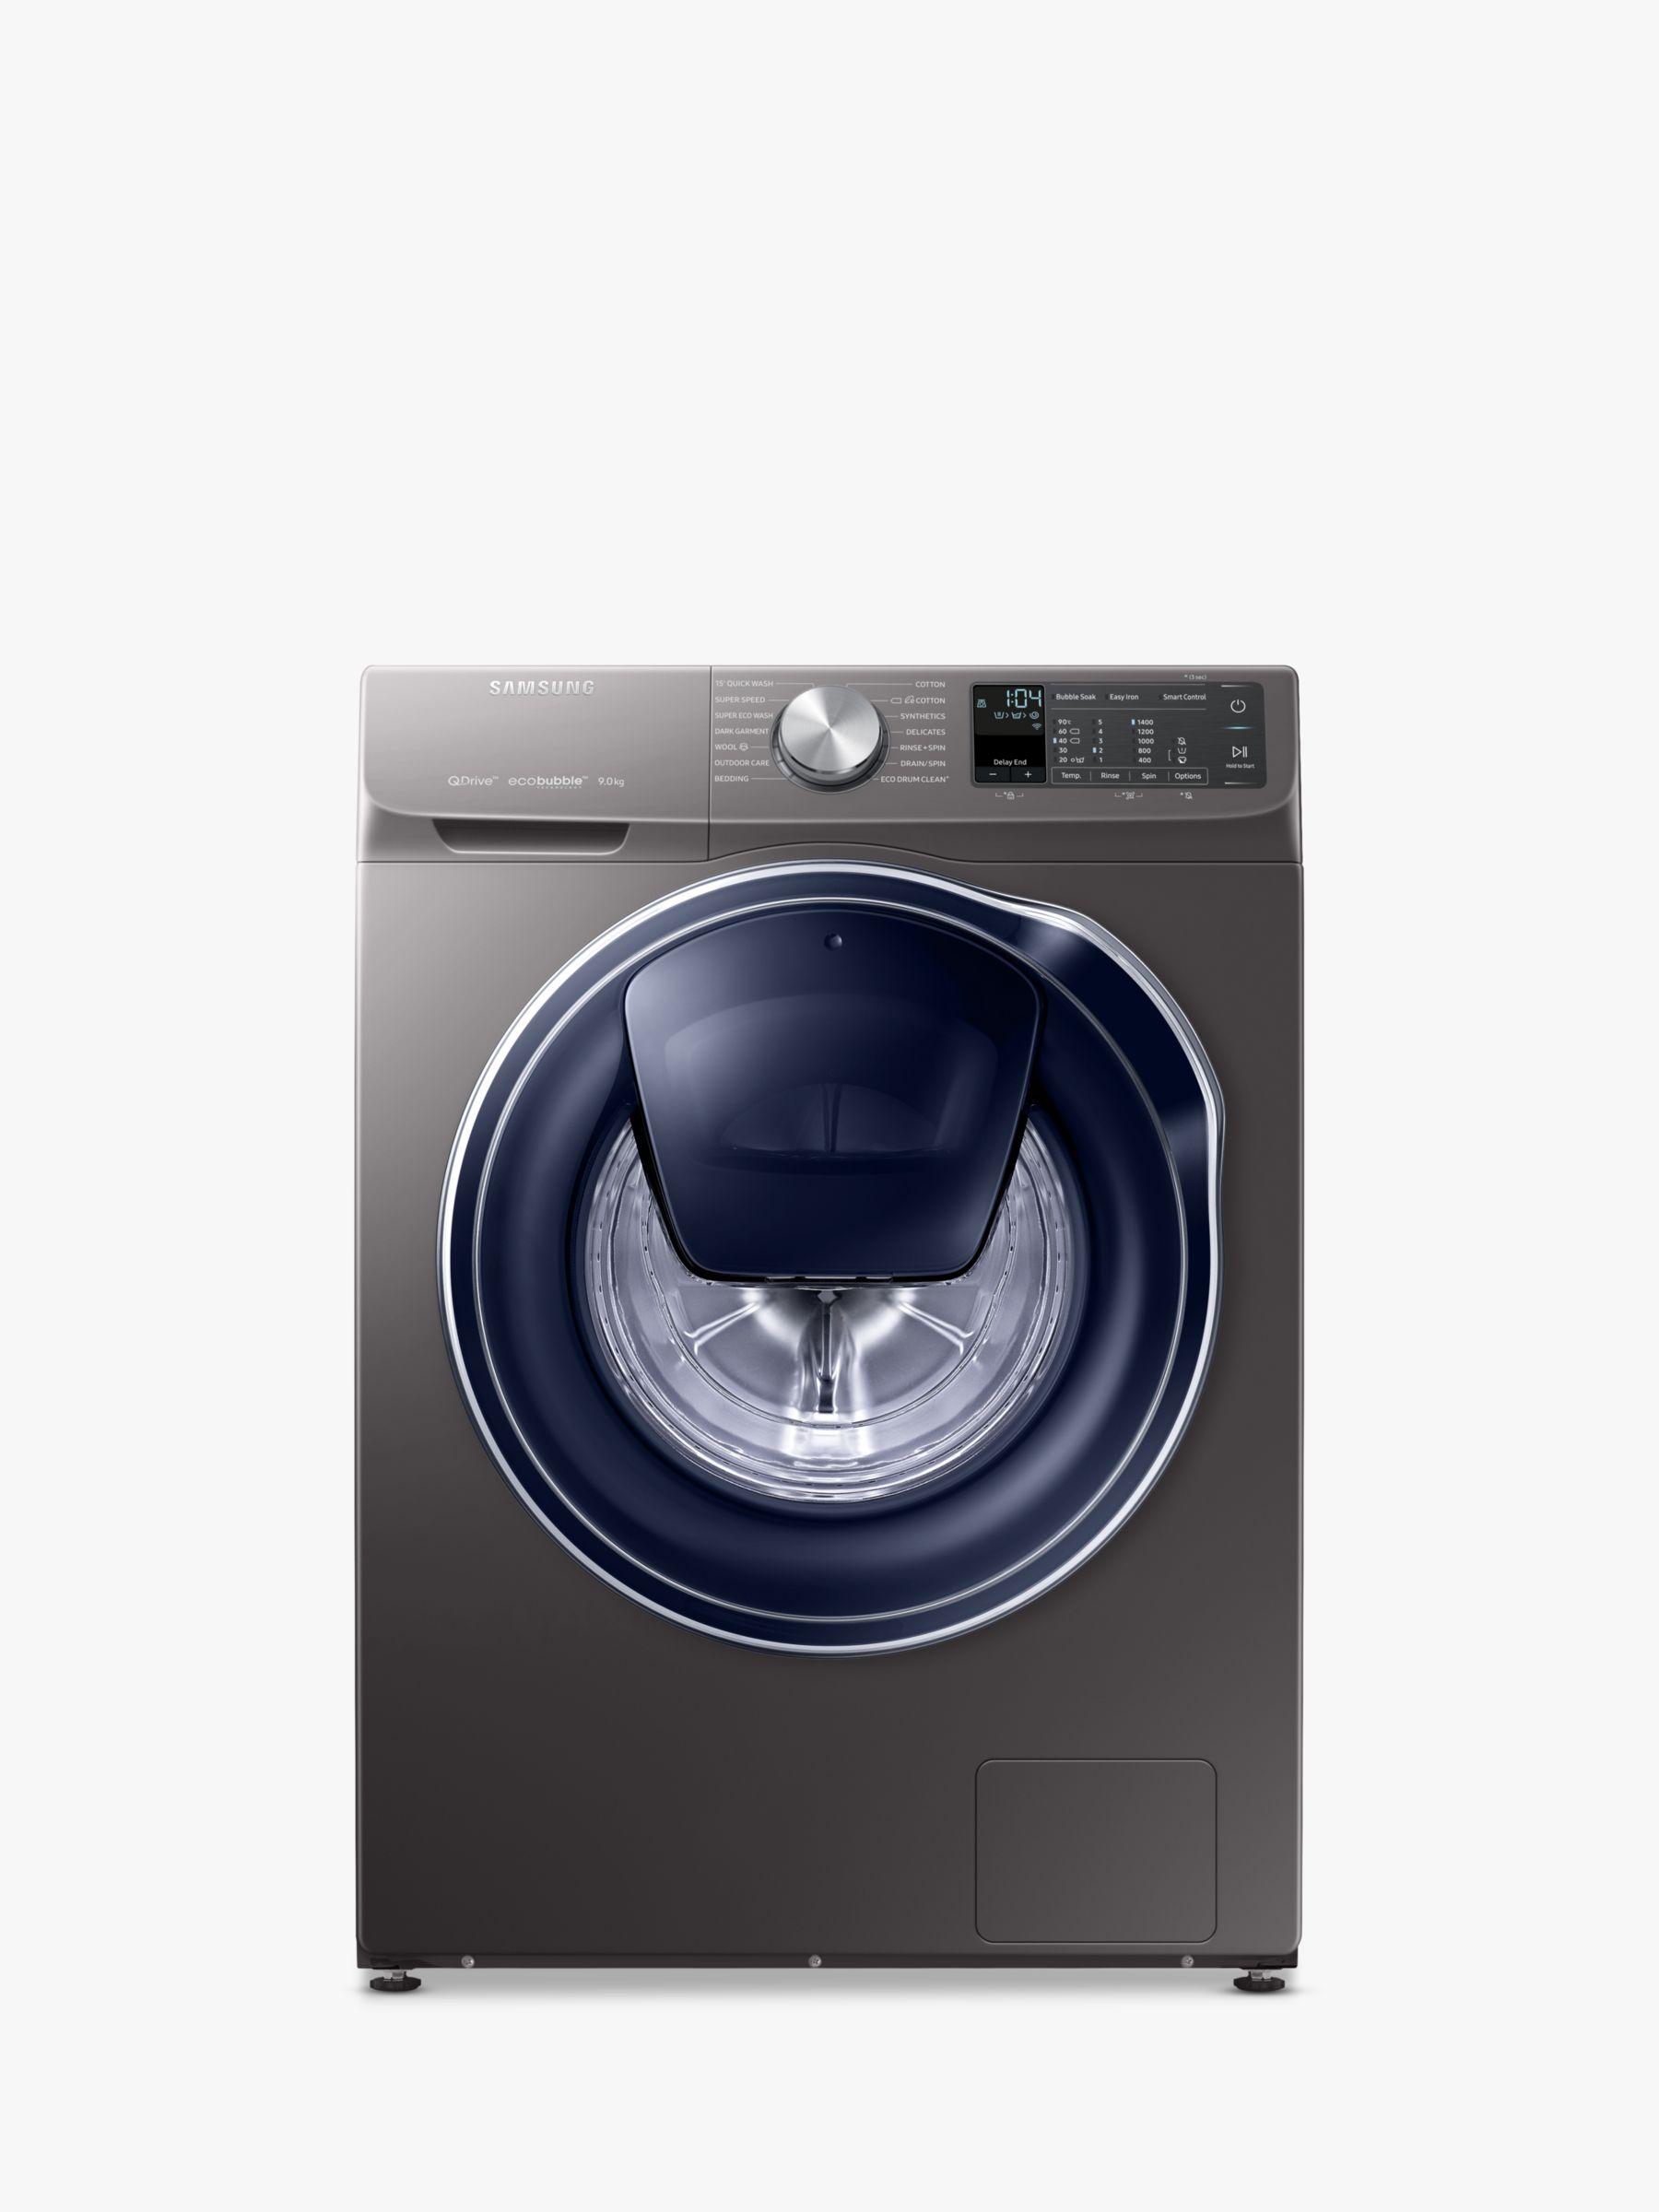 Samsung Samsung QuickDrive WW90M645OPO/EU Freestanding Washing Machine, 9kg Load, A+++ Energy Rating, 1400rpm Spin, Grey/Graphite